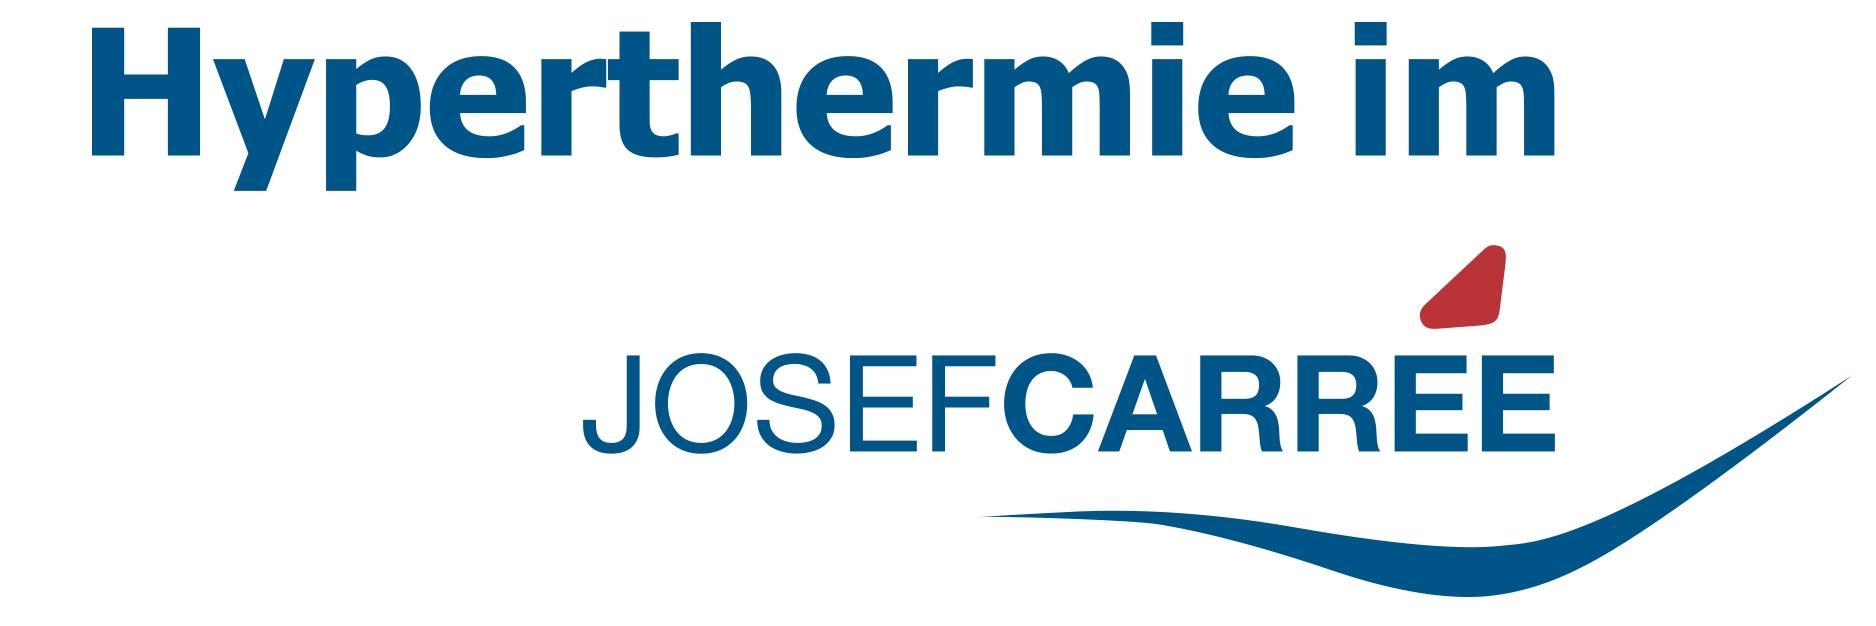 Bild zu Hyperthermie im JosefCarree in Bochum